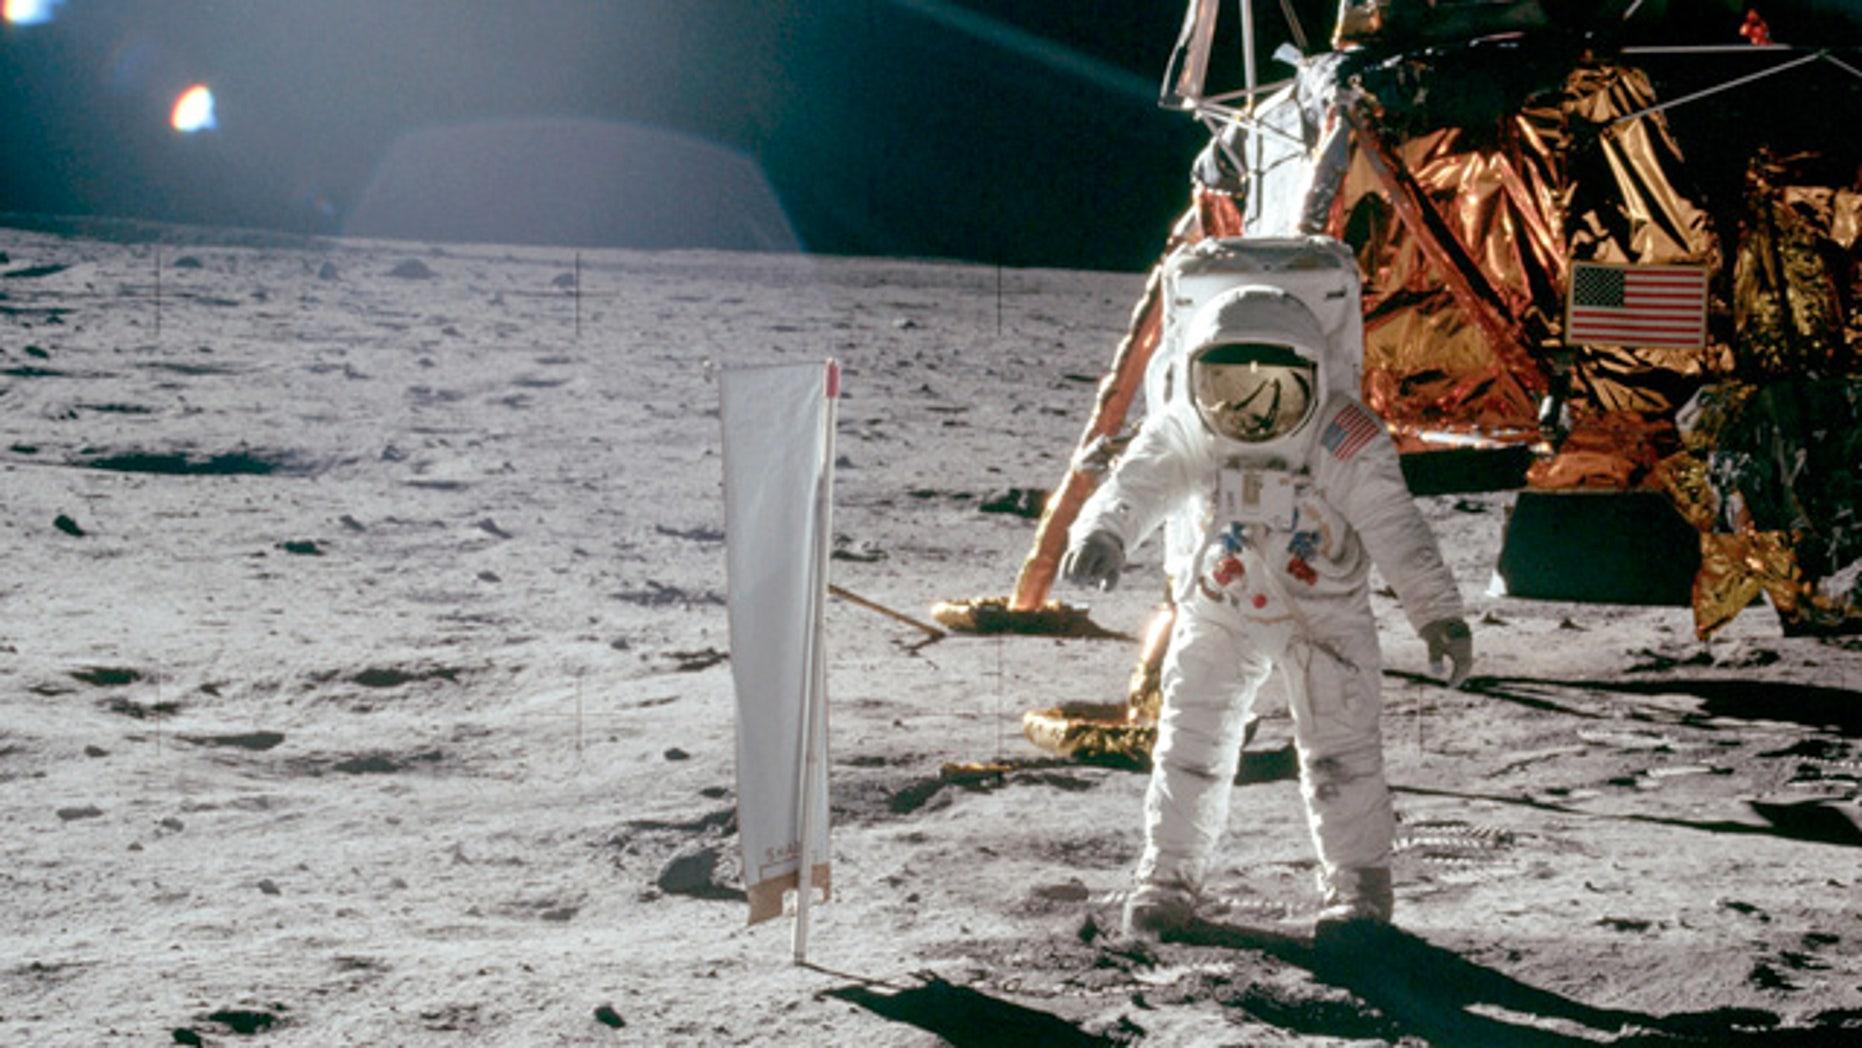 Buzz Aldrin stands on lunar surface in front Lunar Landing Module during Apollo 11's lunar mission.